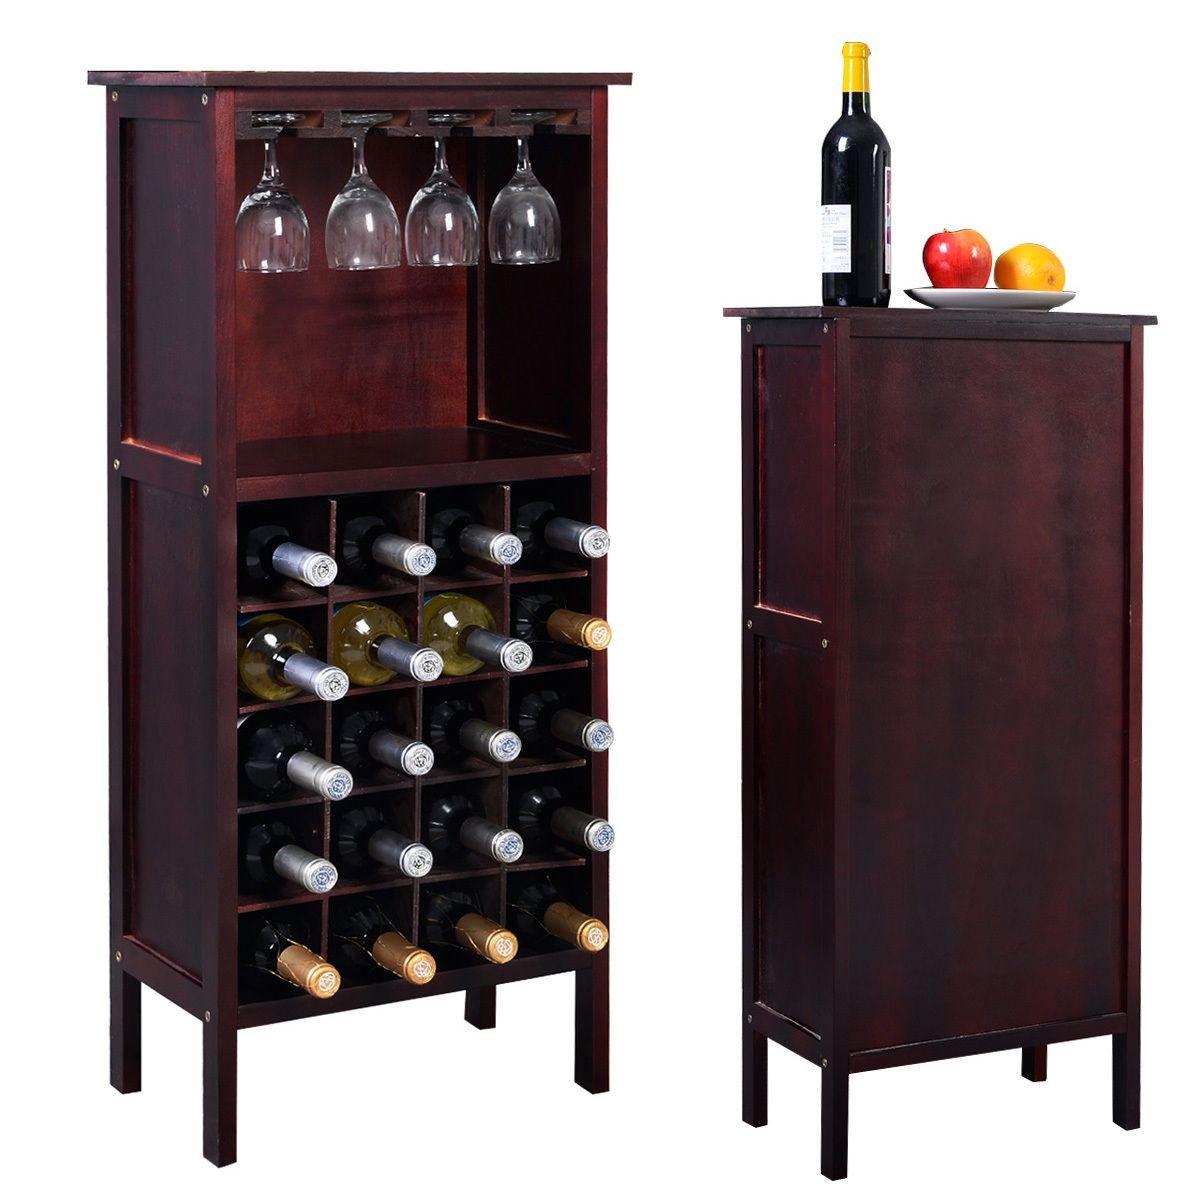 MasterPanel - Wood Wine Cabinet Bottle Holder Storage Kitchen Home Bar w/ Glass Rack #TP3349